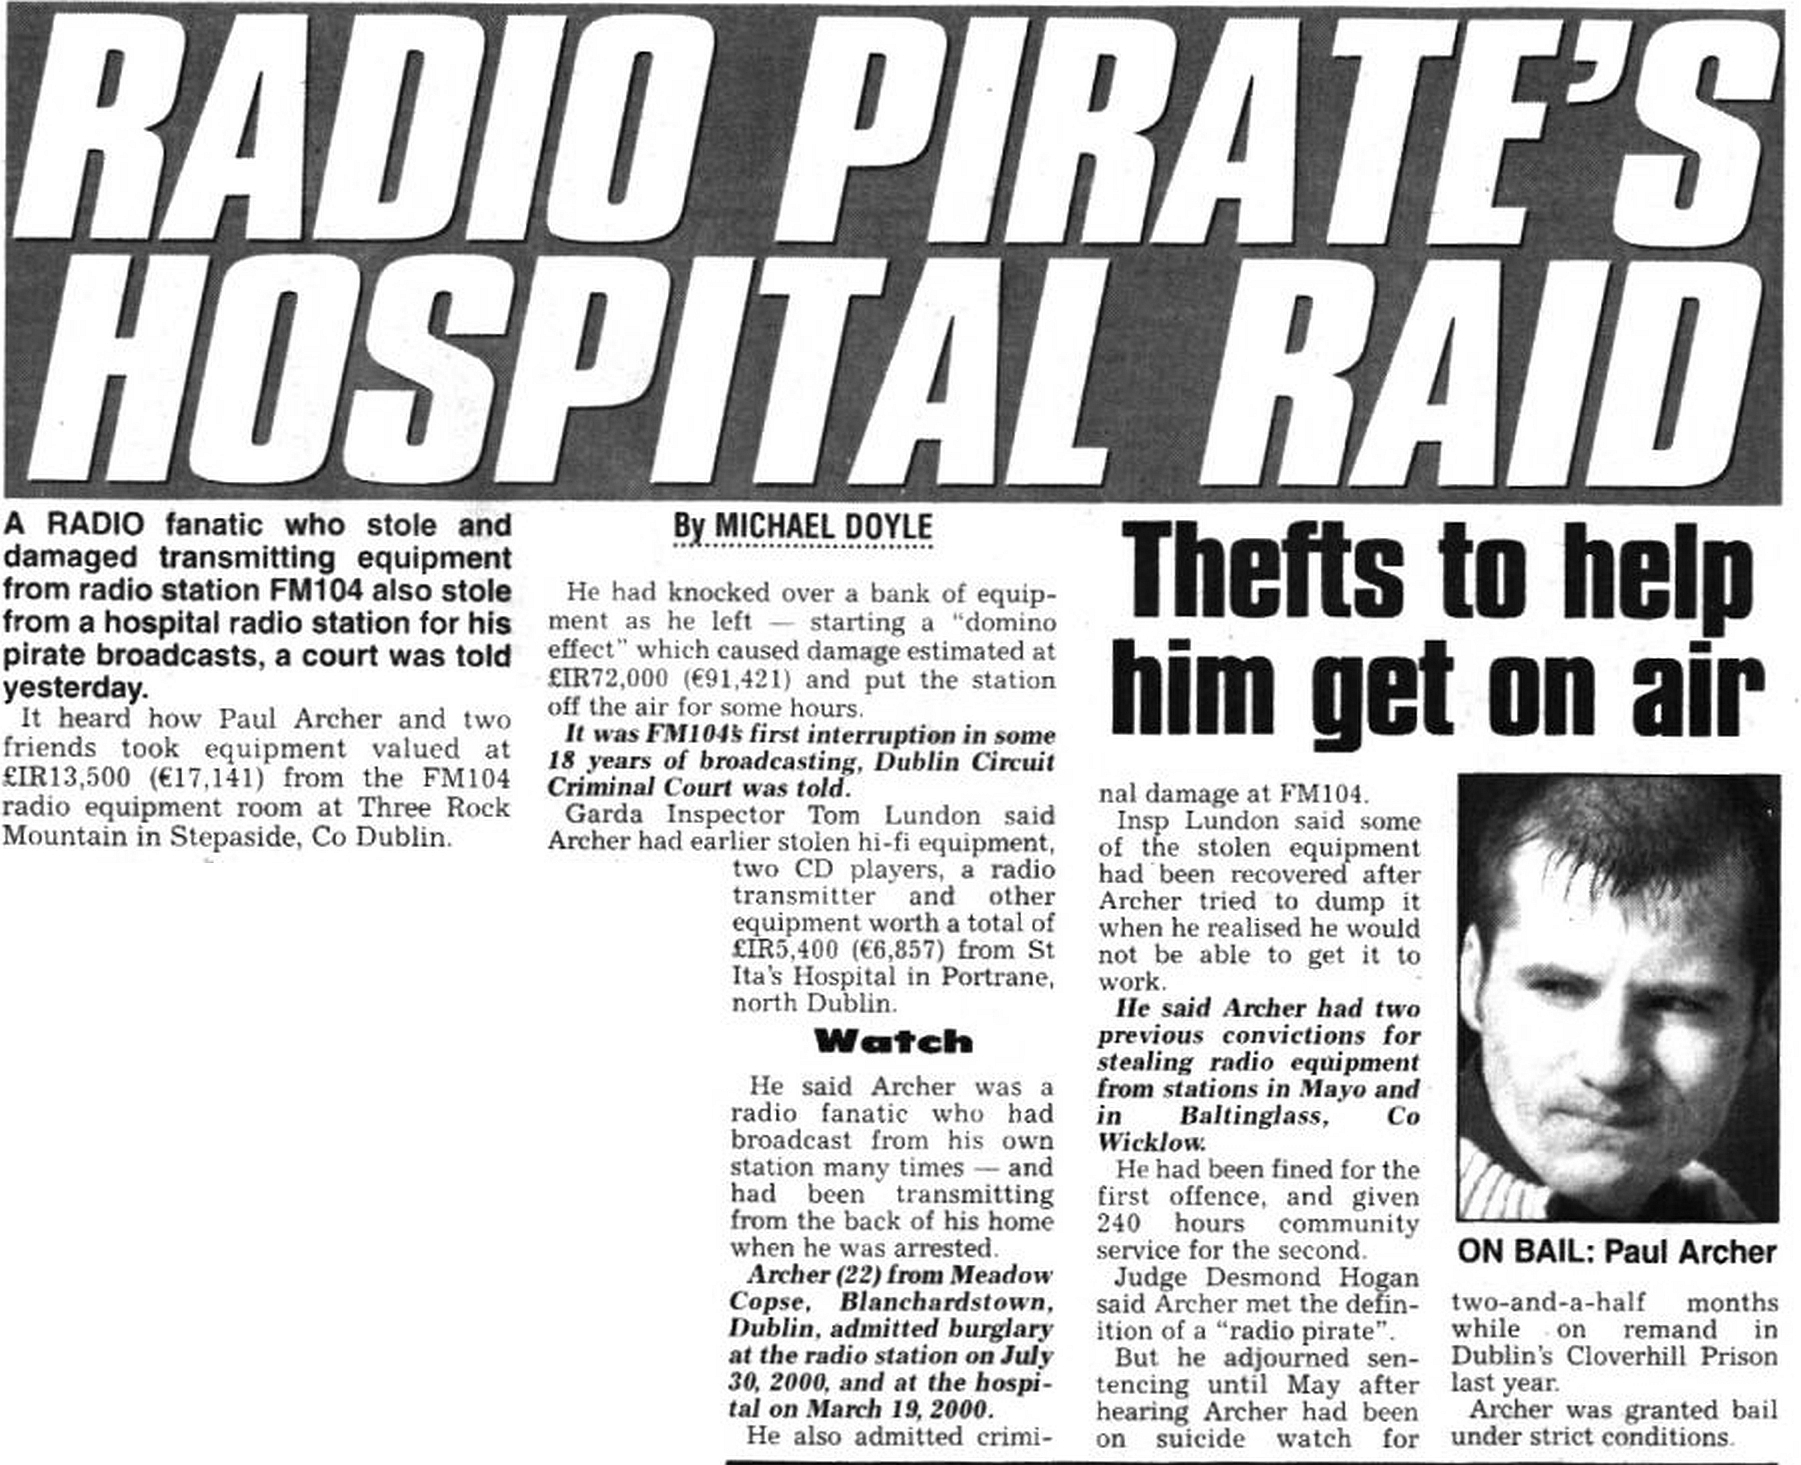 The Star - Radio pirate's hospital raid